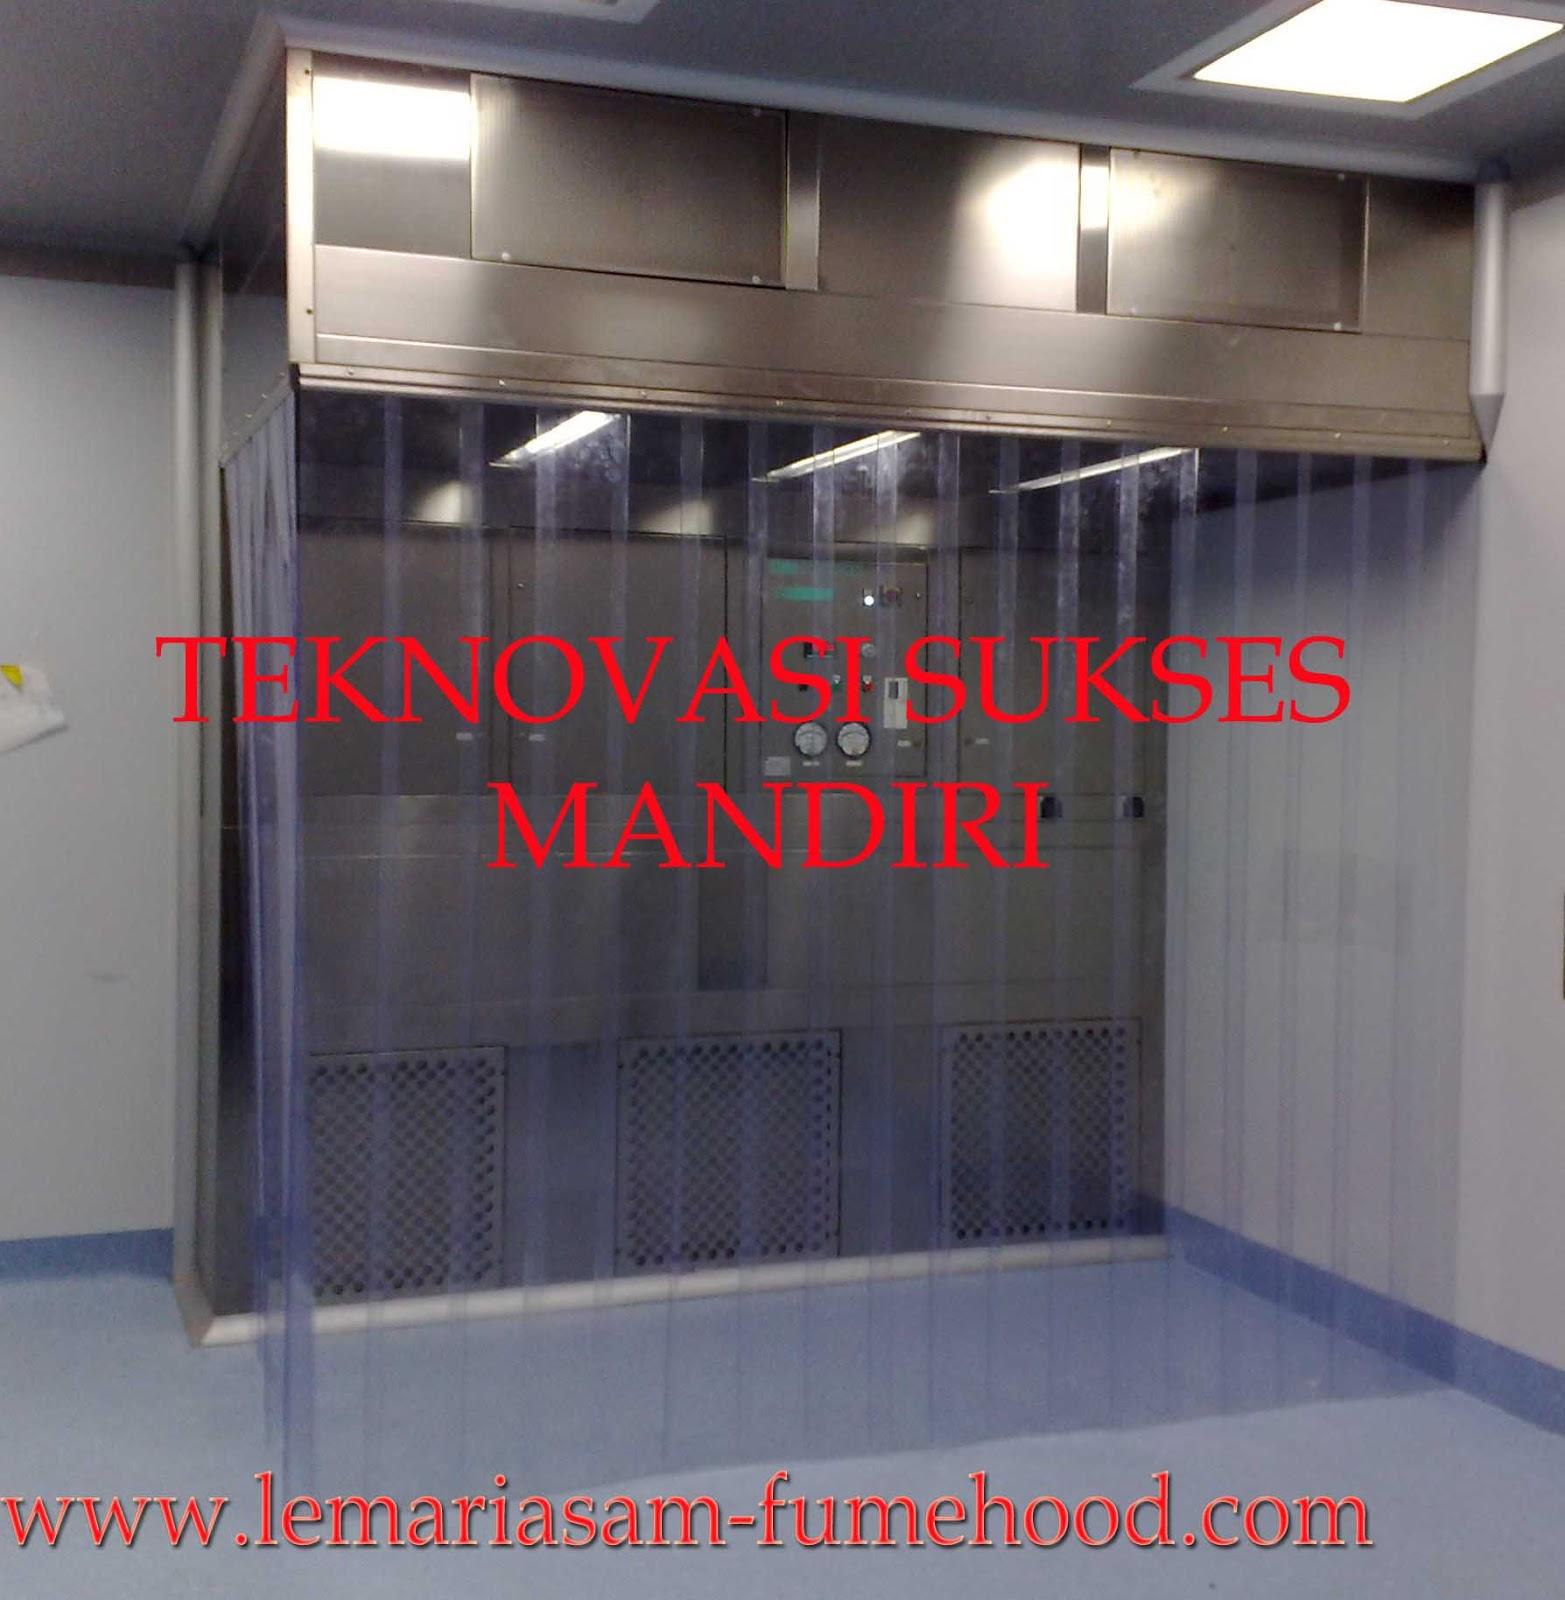 Lemari asam fume hood laminar air flow room for Air circulation in a room